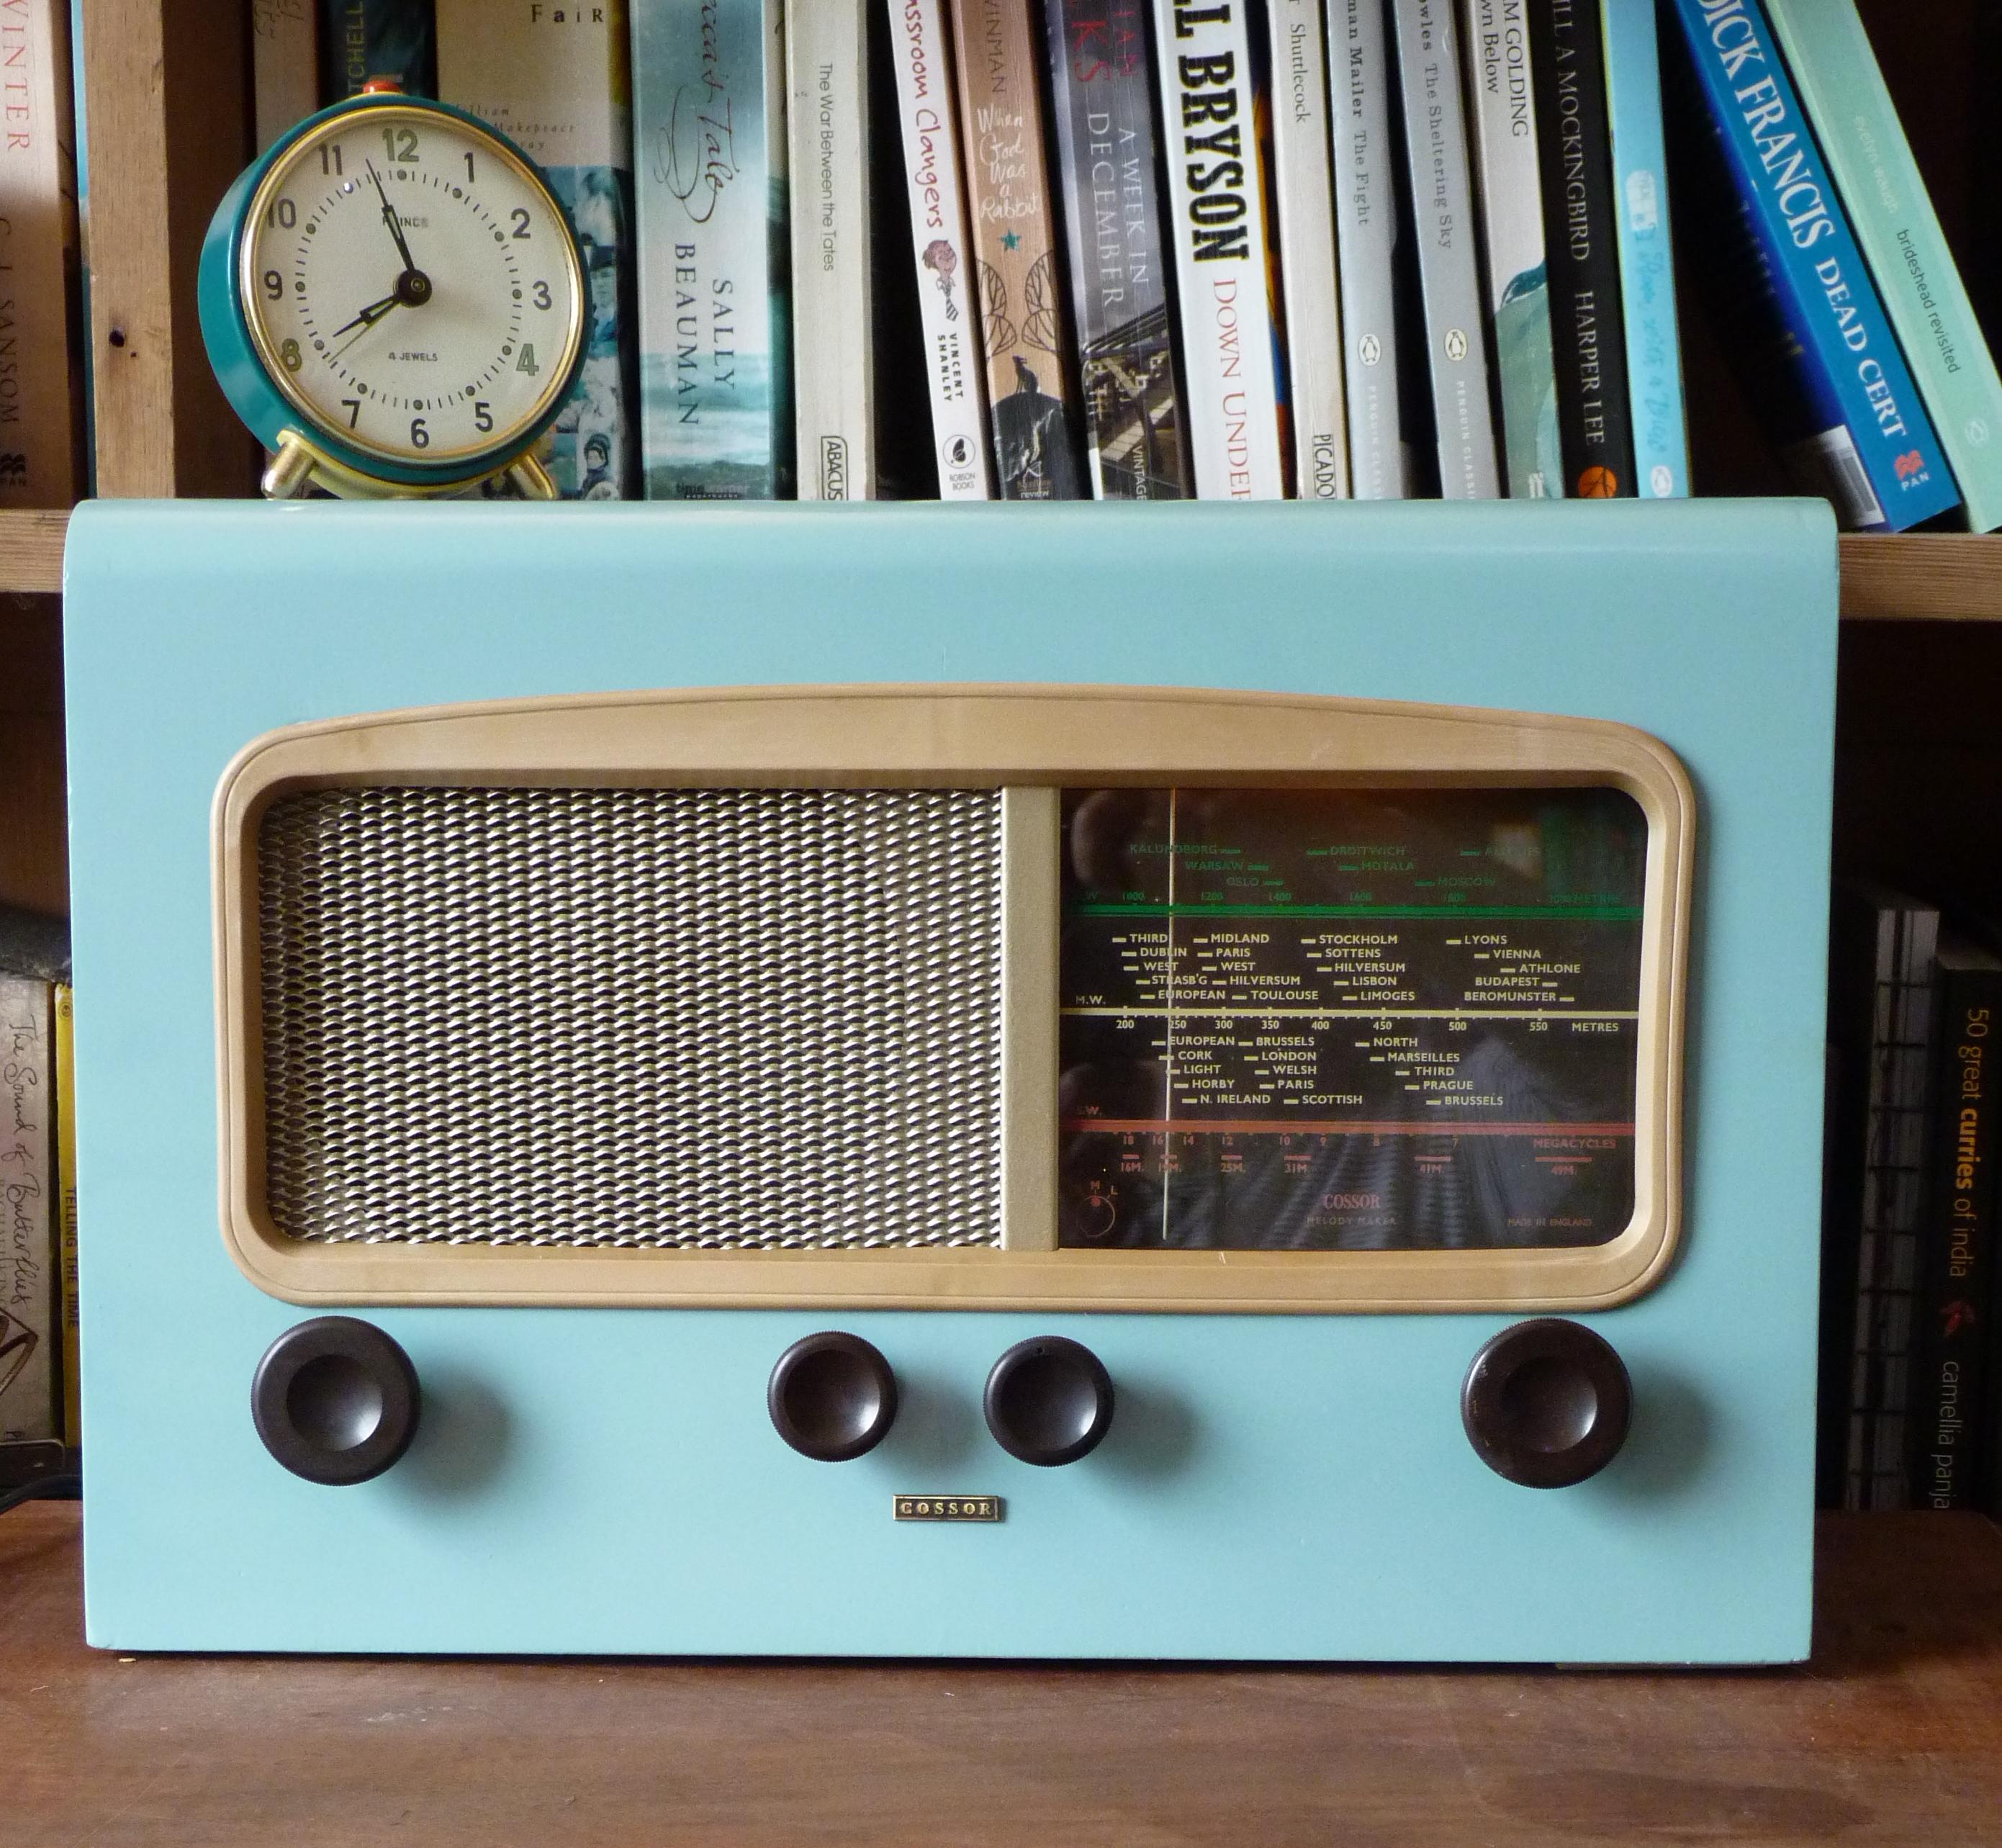 Vintage farmyard radio wayne 39 s radios for Classic house radio station